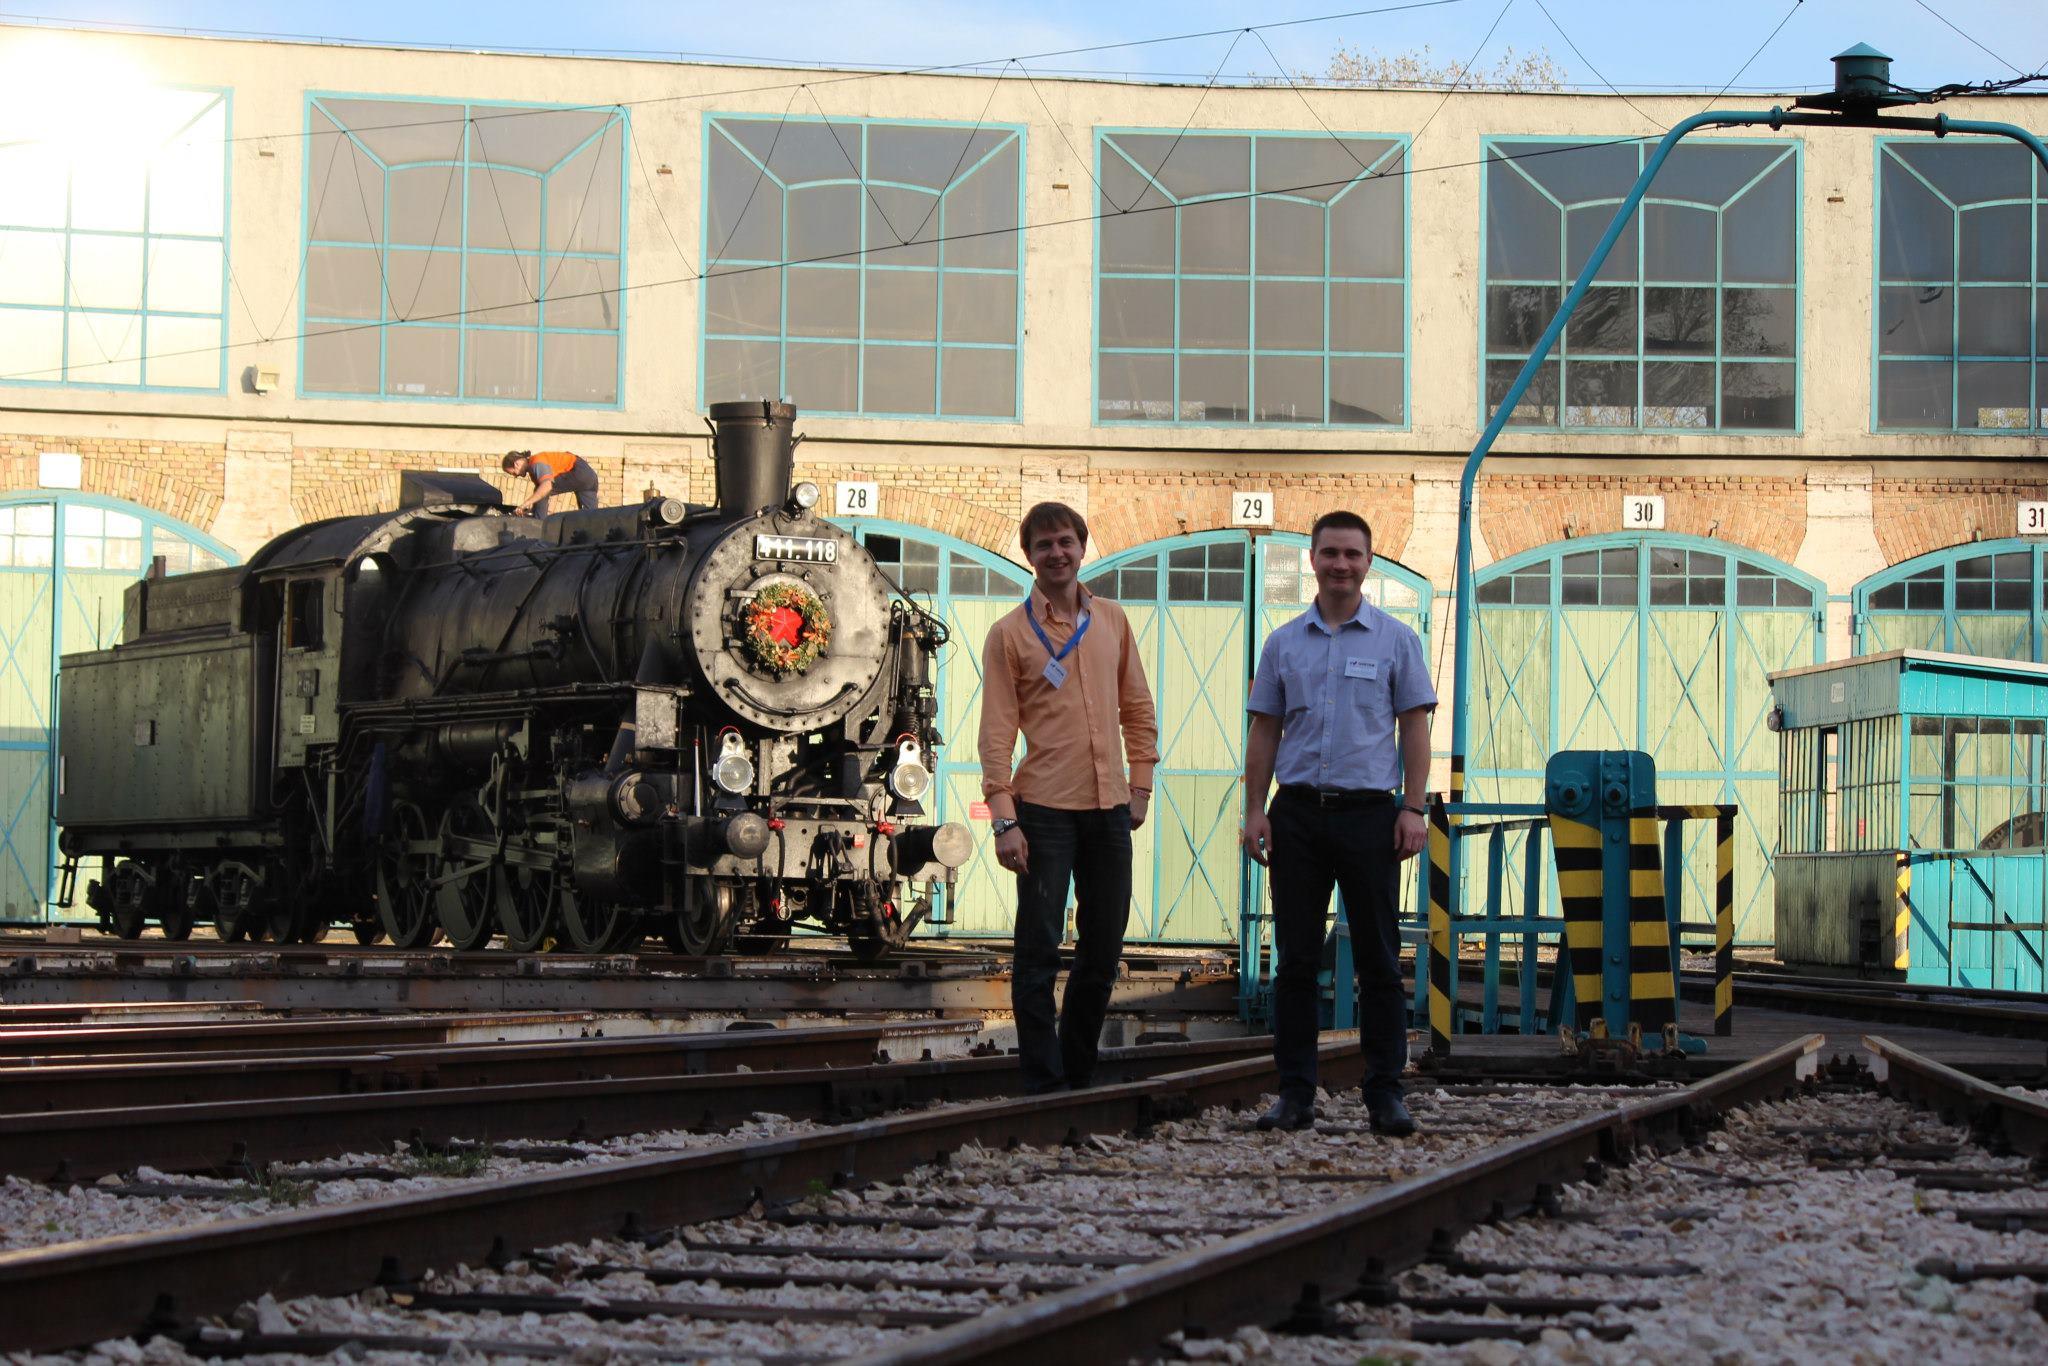 In Budapest railway museum